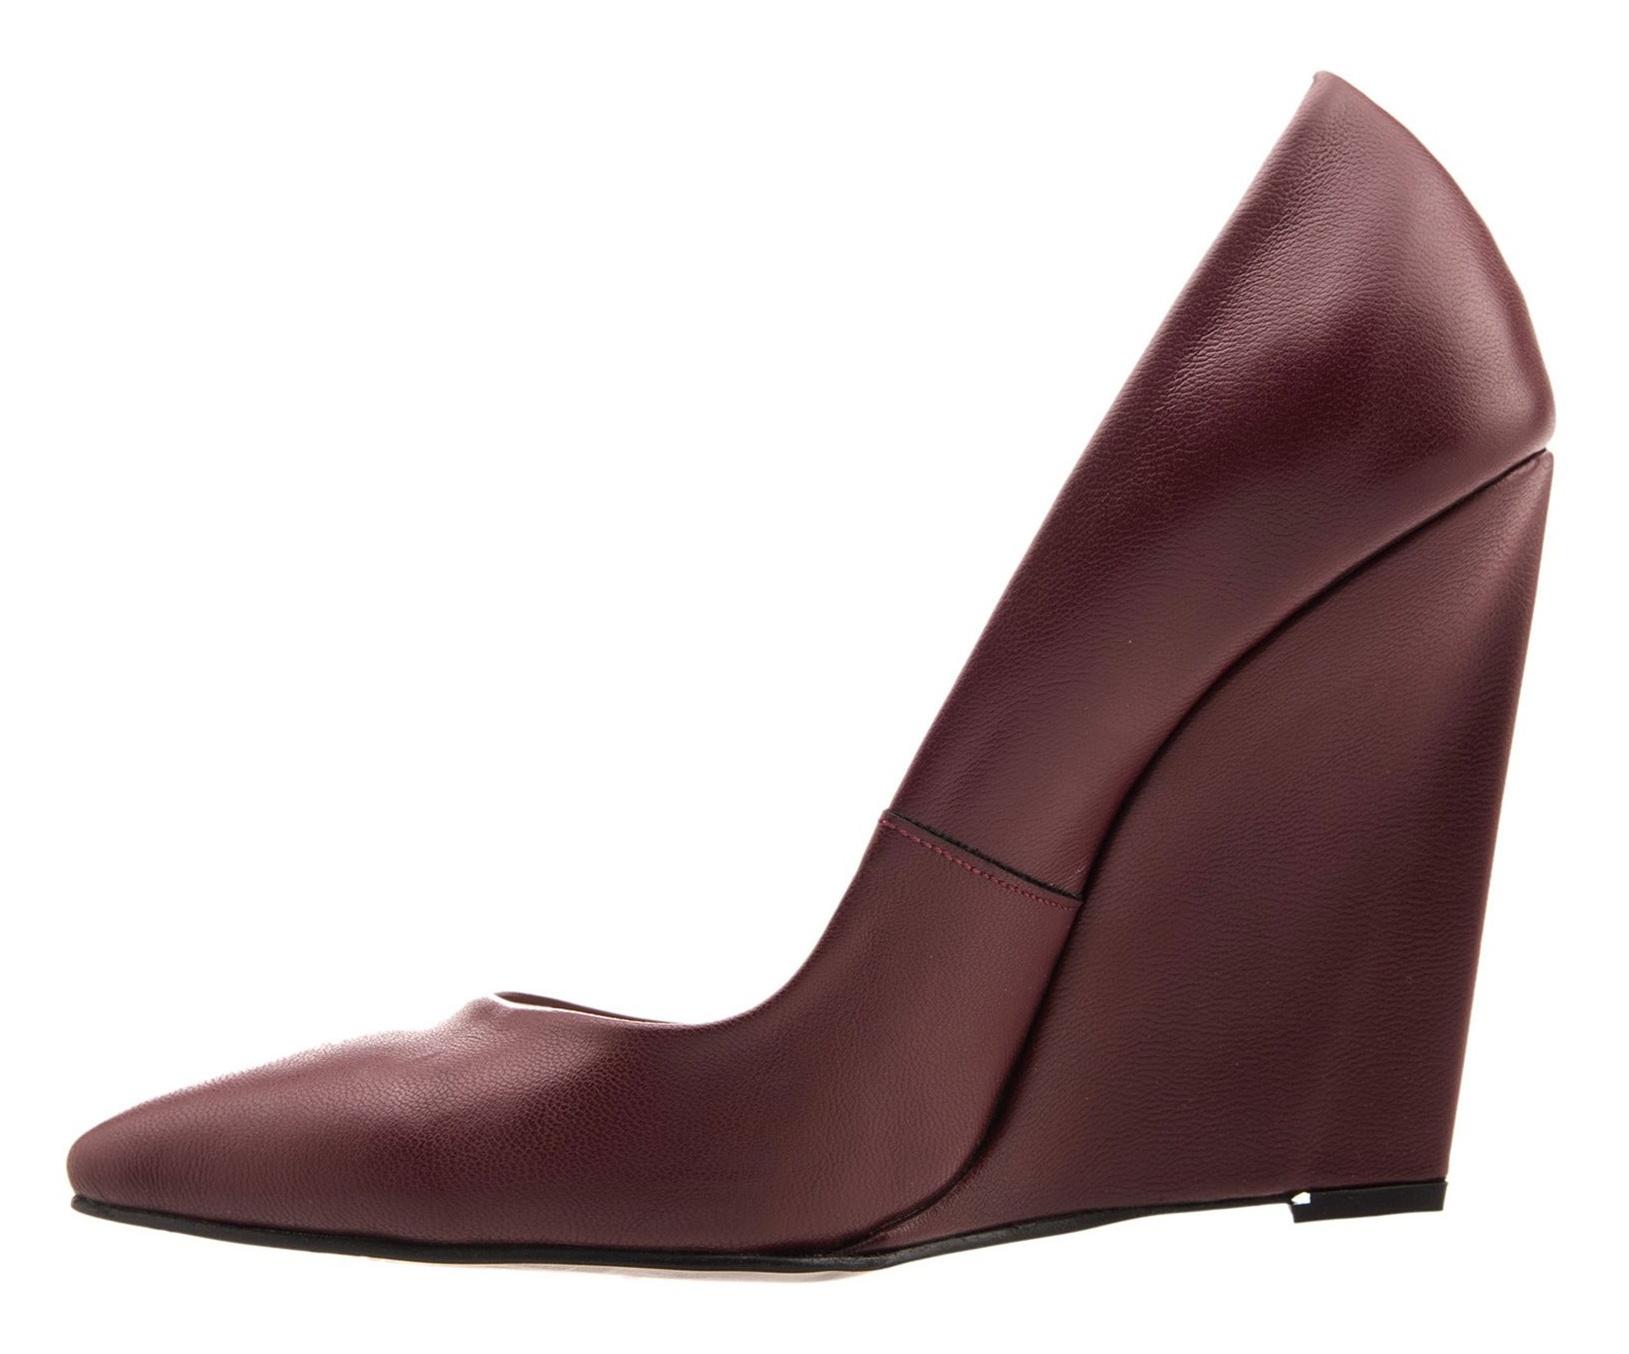 کفش پاشنه بلند چرم زنانه - شهر چرم - شاه بلوطي - 2